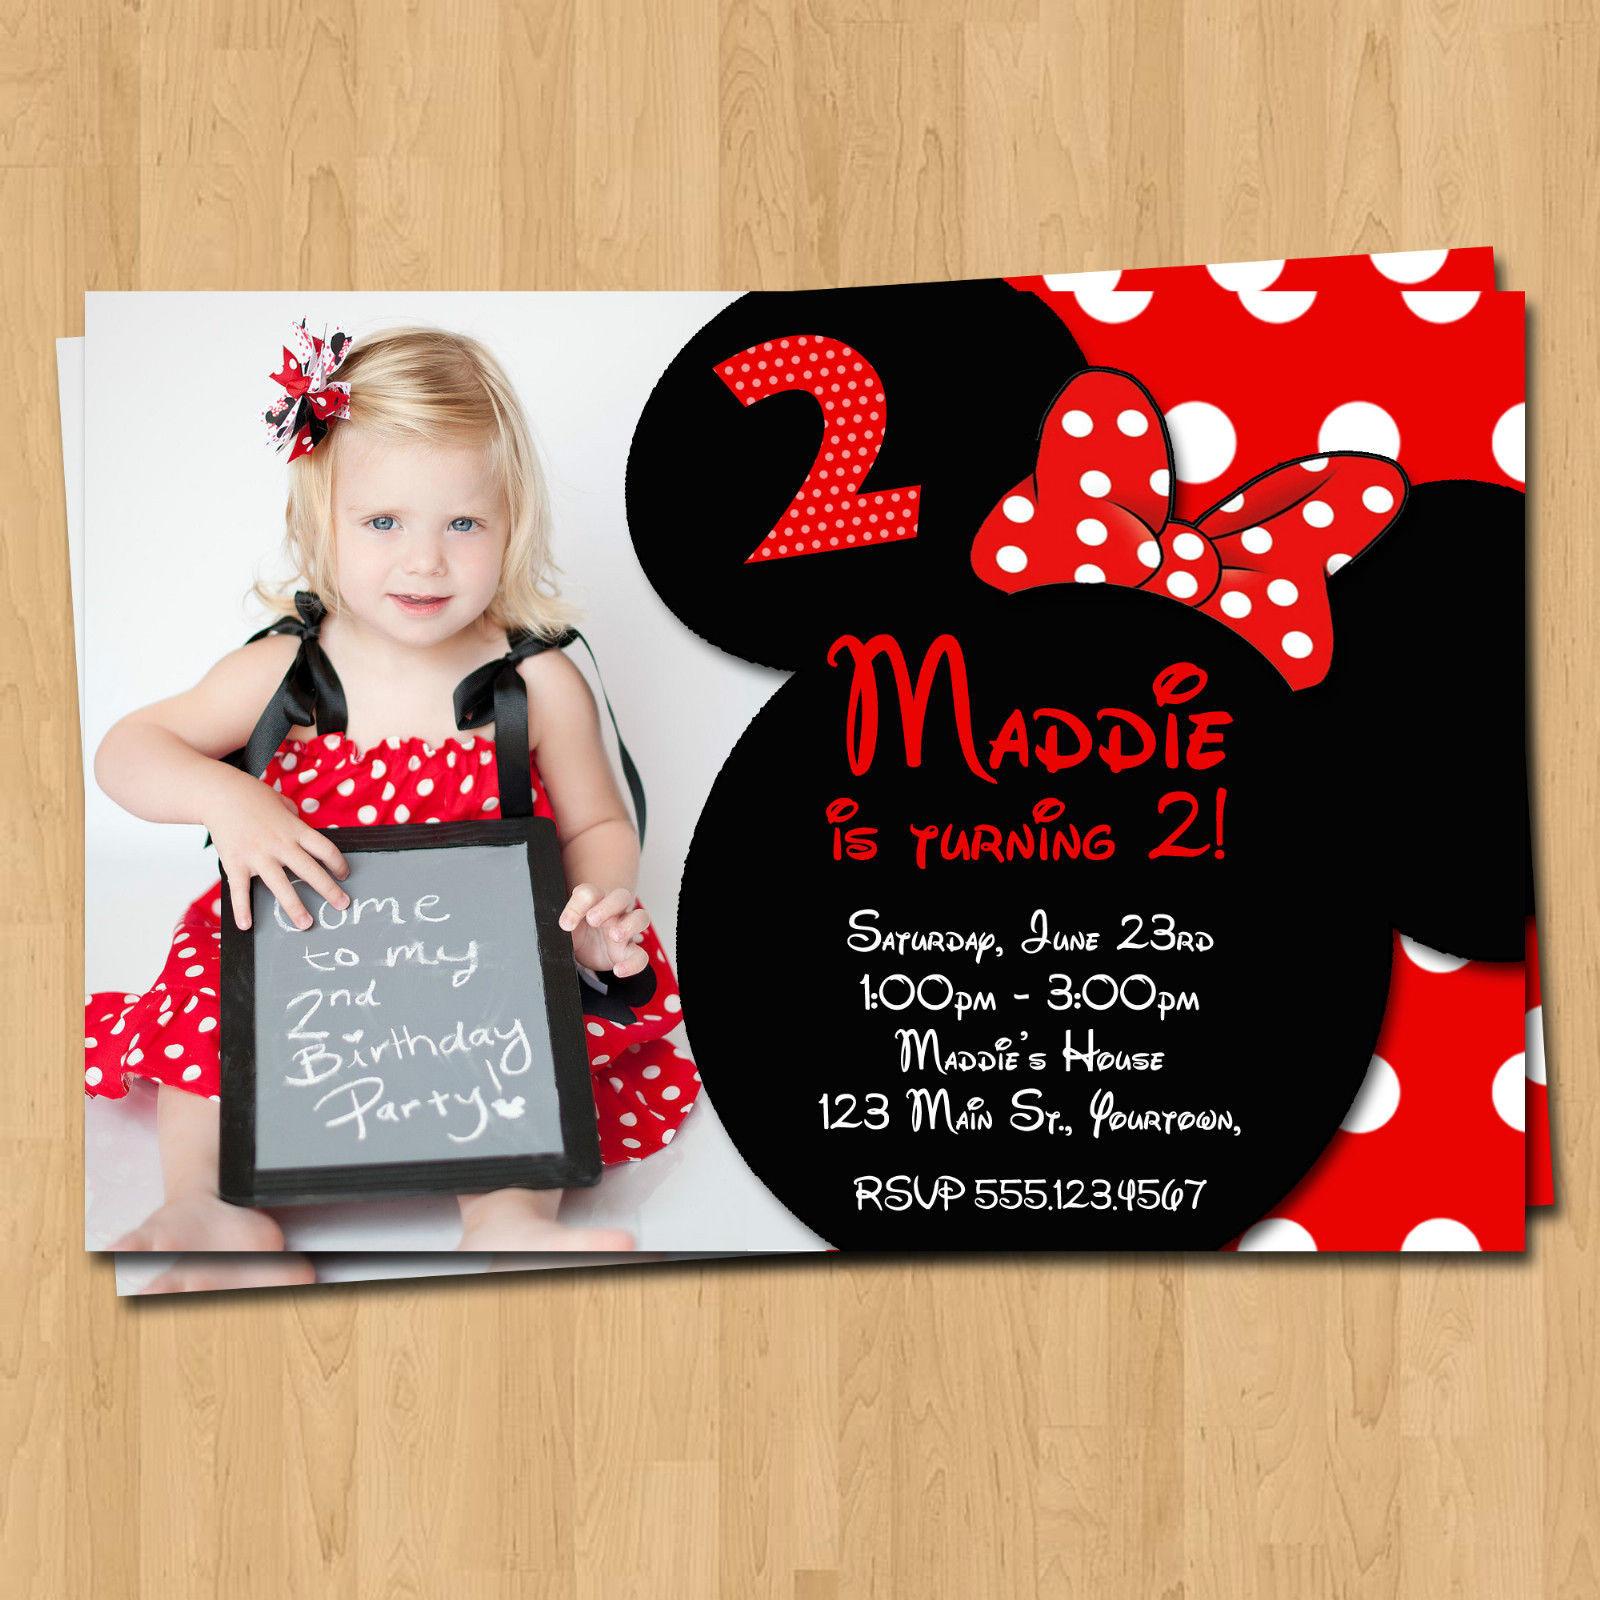 Minnie Birthday Invitations  Free Printable Minnie Mouse Birthday Party Invitations